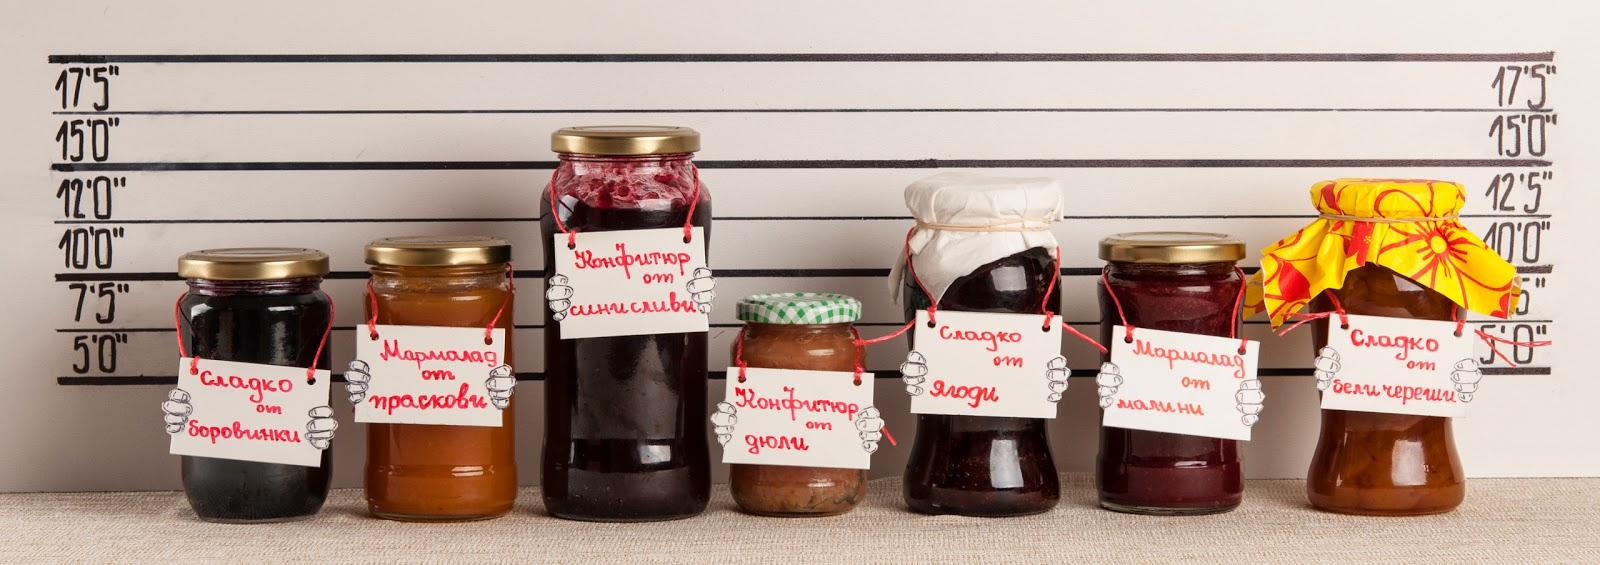 Сладка, конфитюри и мармалади